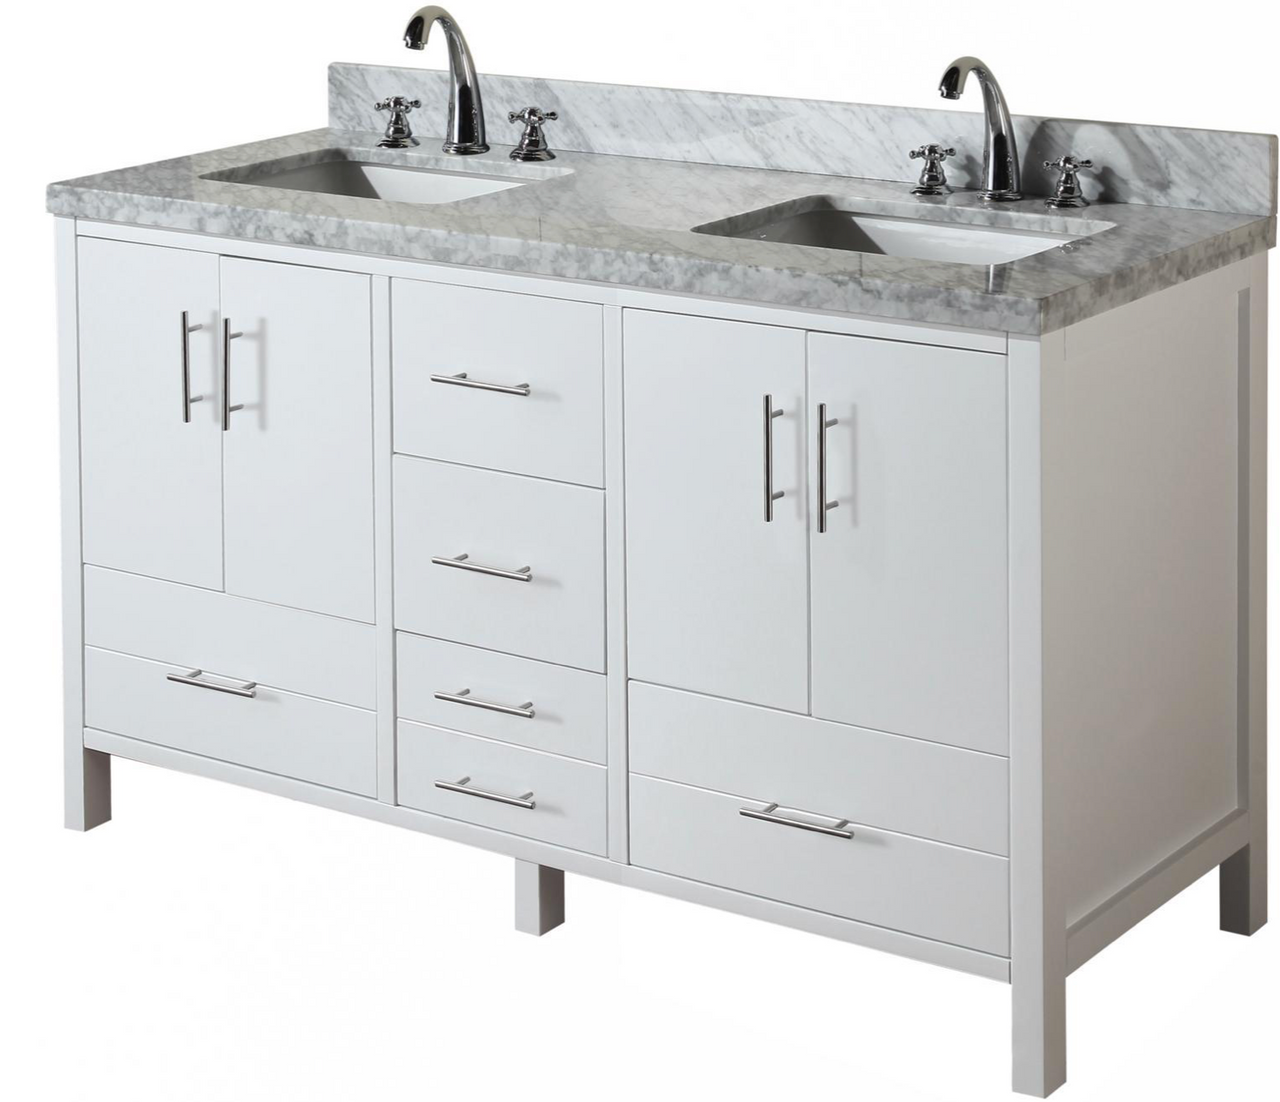 Ultra 60 Inch White Double Sink Bathroom Vanity New